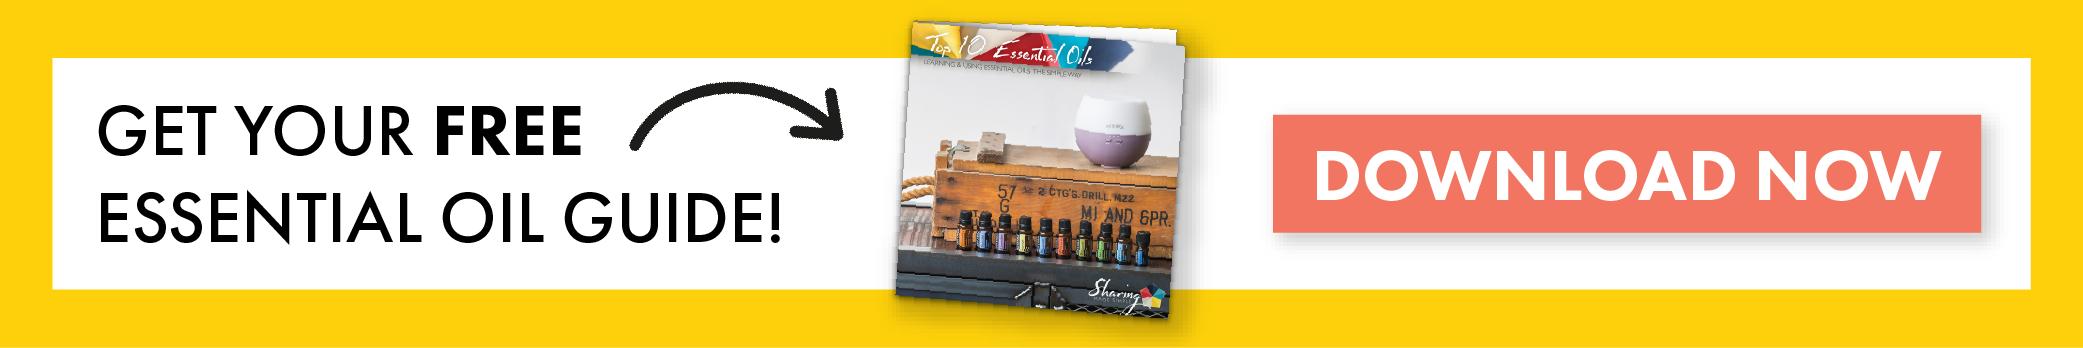 Get Your Free Top 10 doTERRA Essential Oils Guide - Happy Healthy Joe Integrative Health Coach